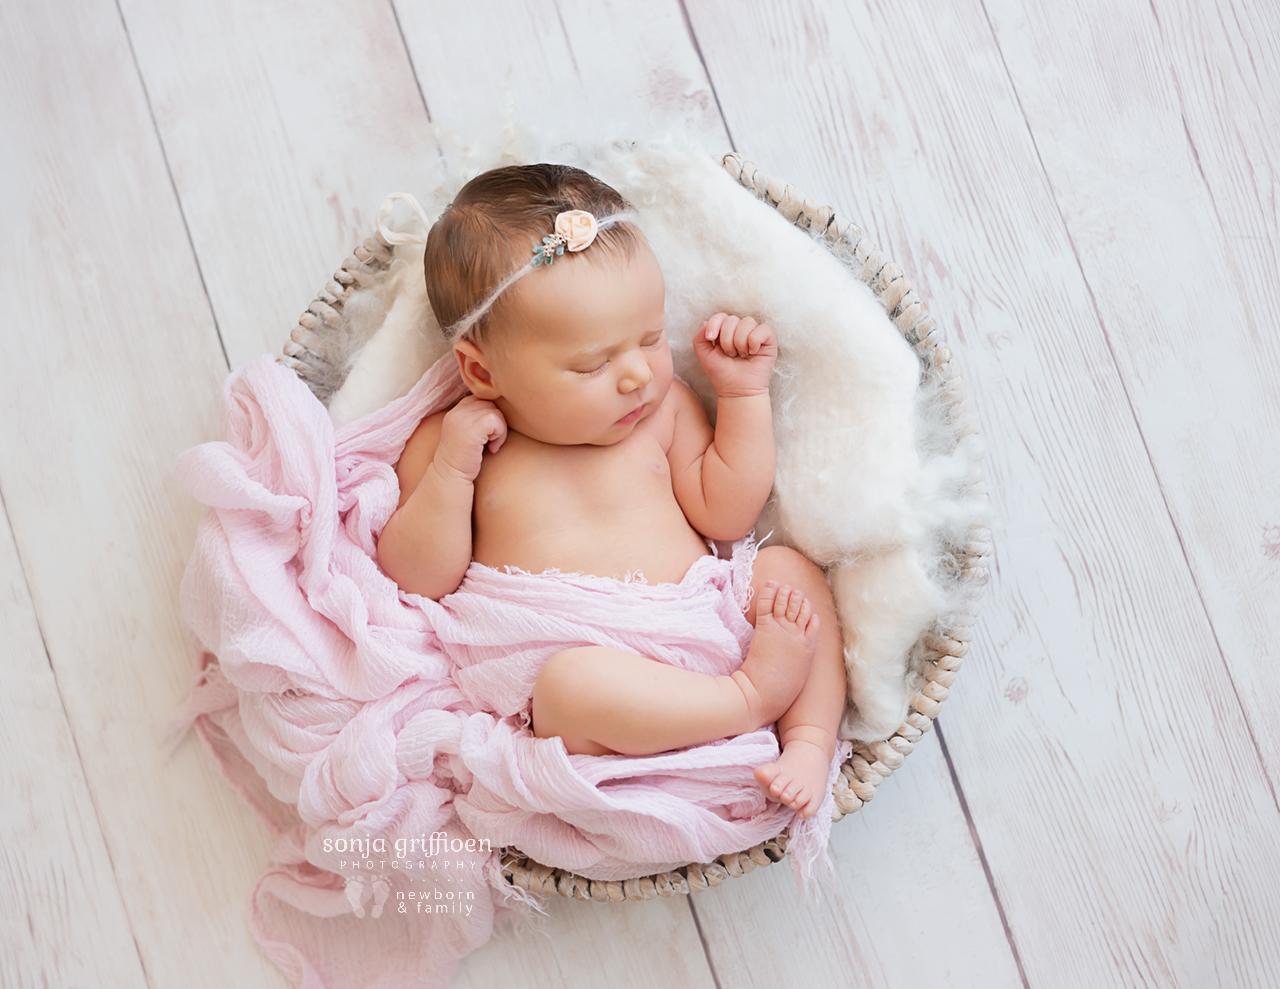 Maya-Newborn-Brisbane-Newborn-Photographer-Sonja-Griffioen-13b.jpg